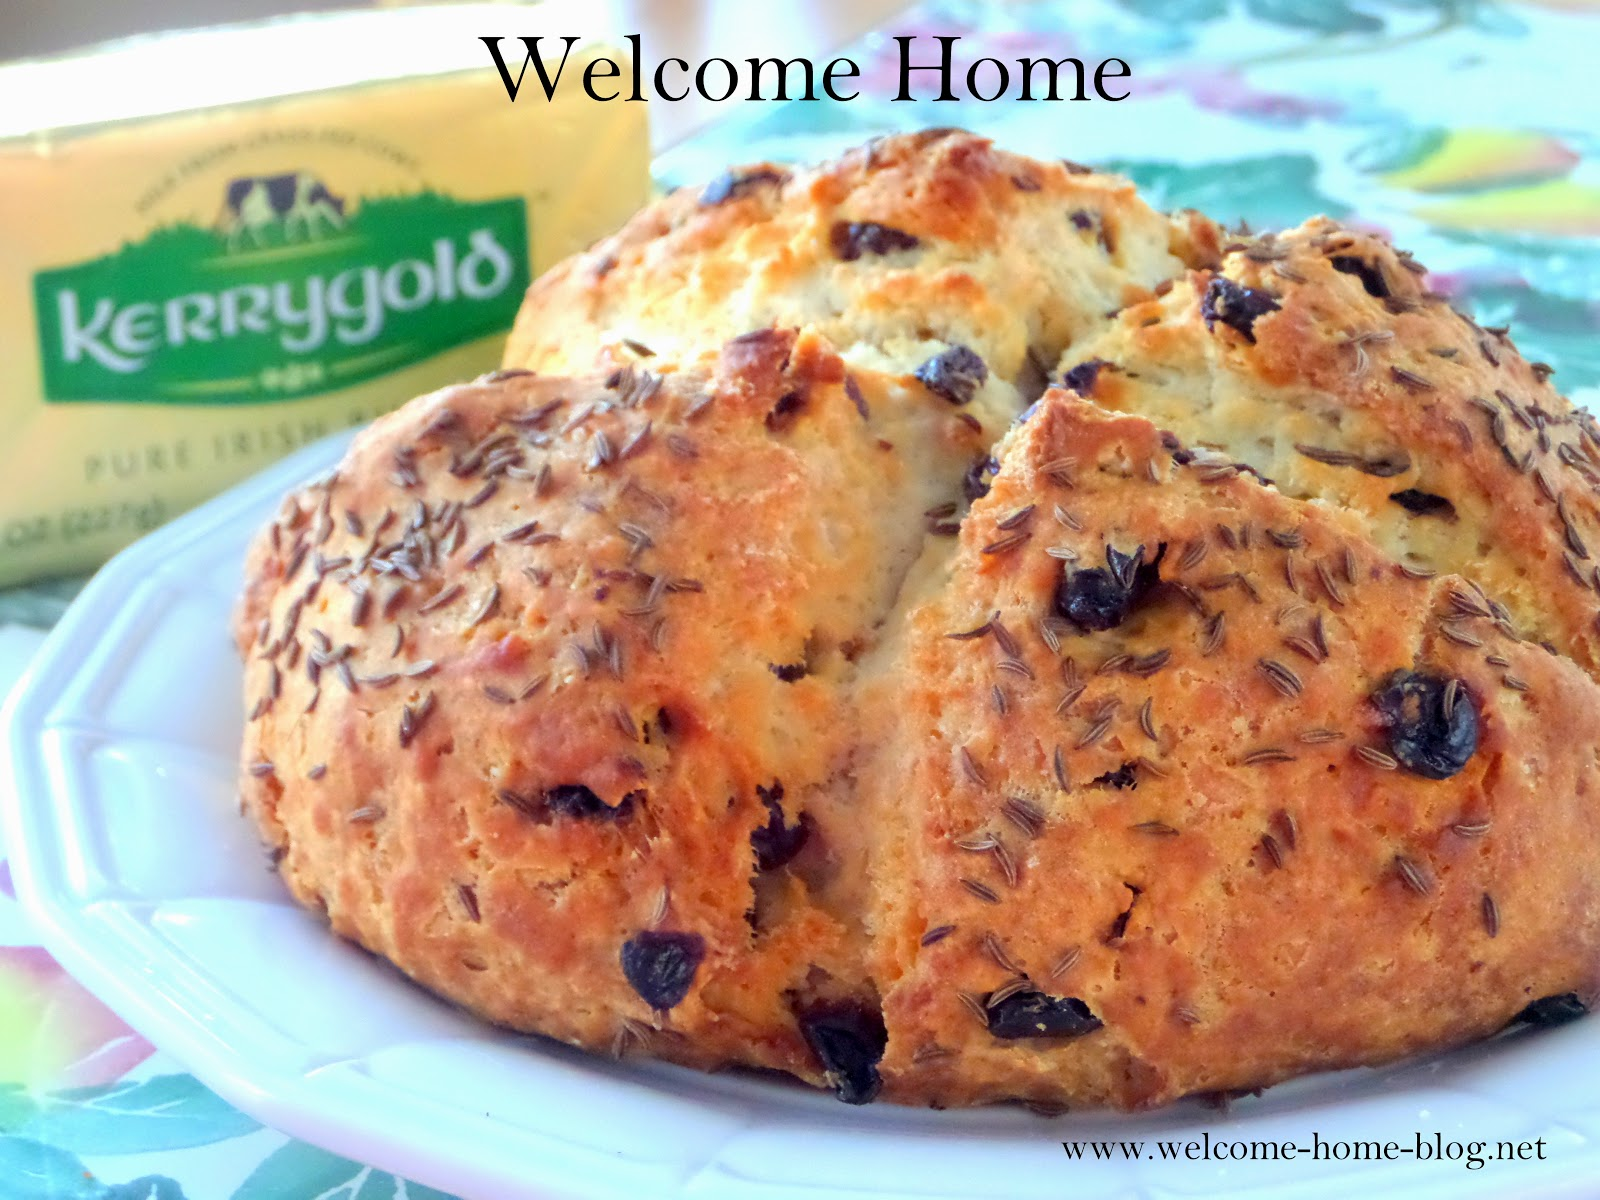 Welcome Home Blog: Irish Soda Bread with Raisins and Caraway Seed